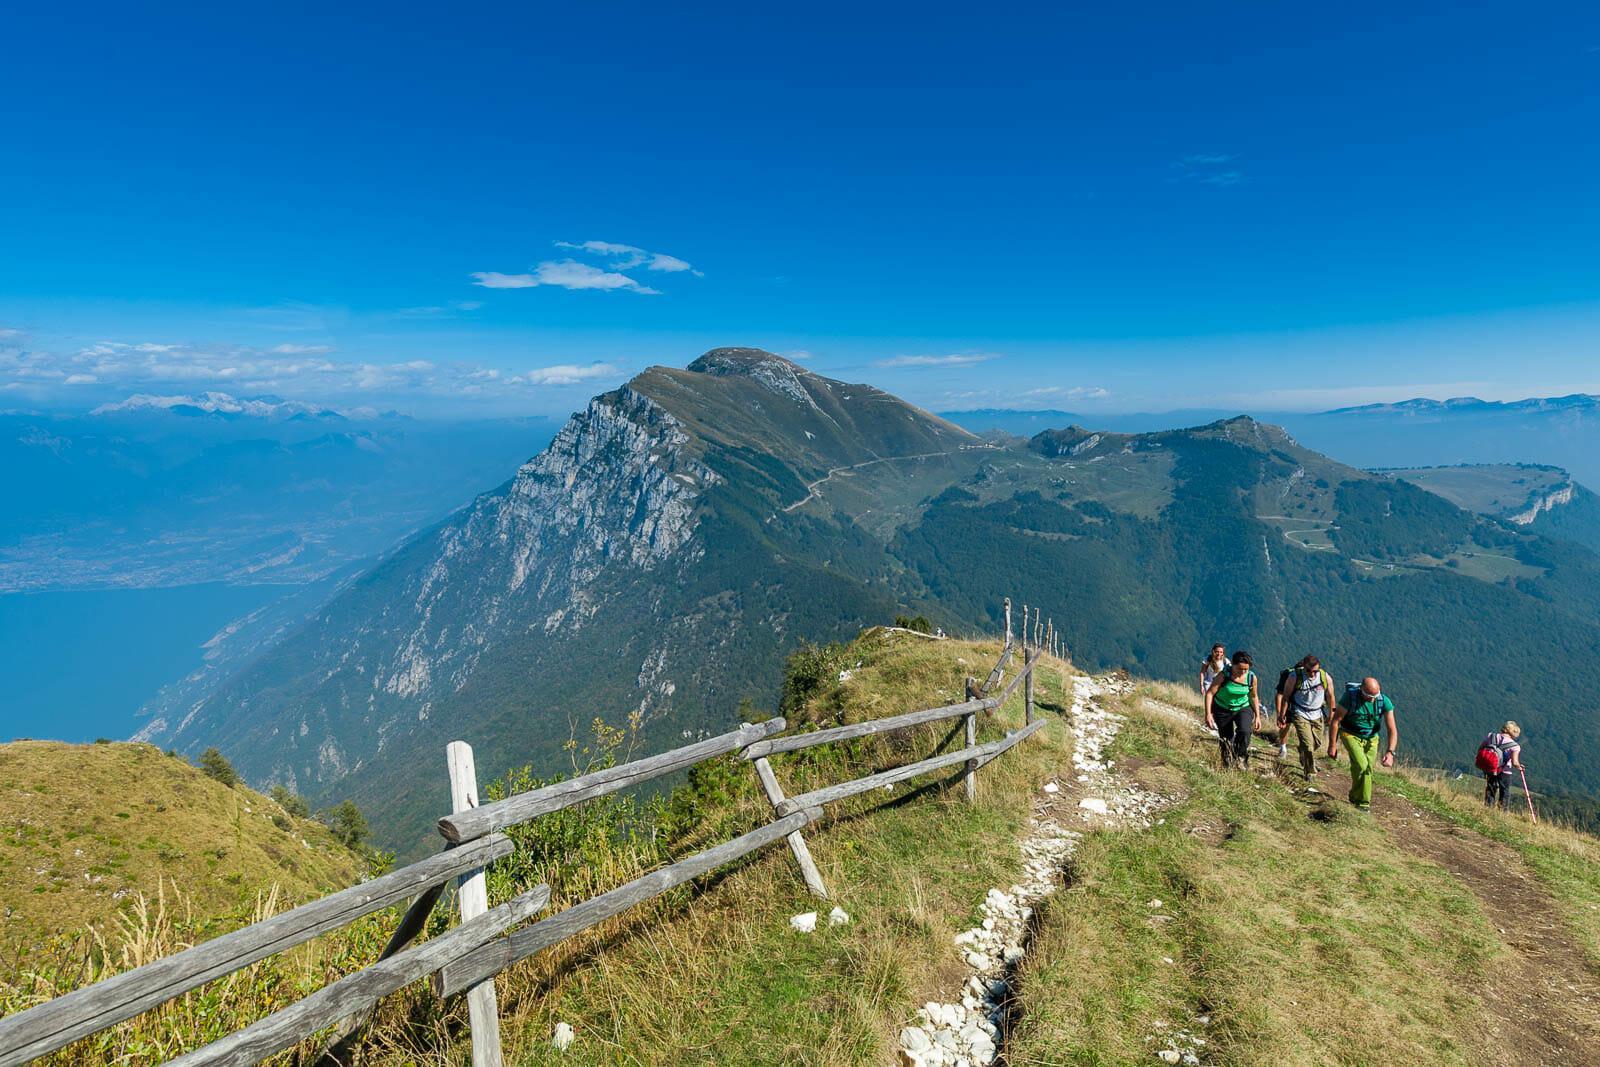 path 651 on Monte Baldo